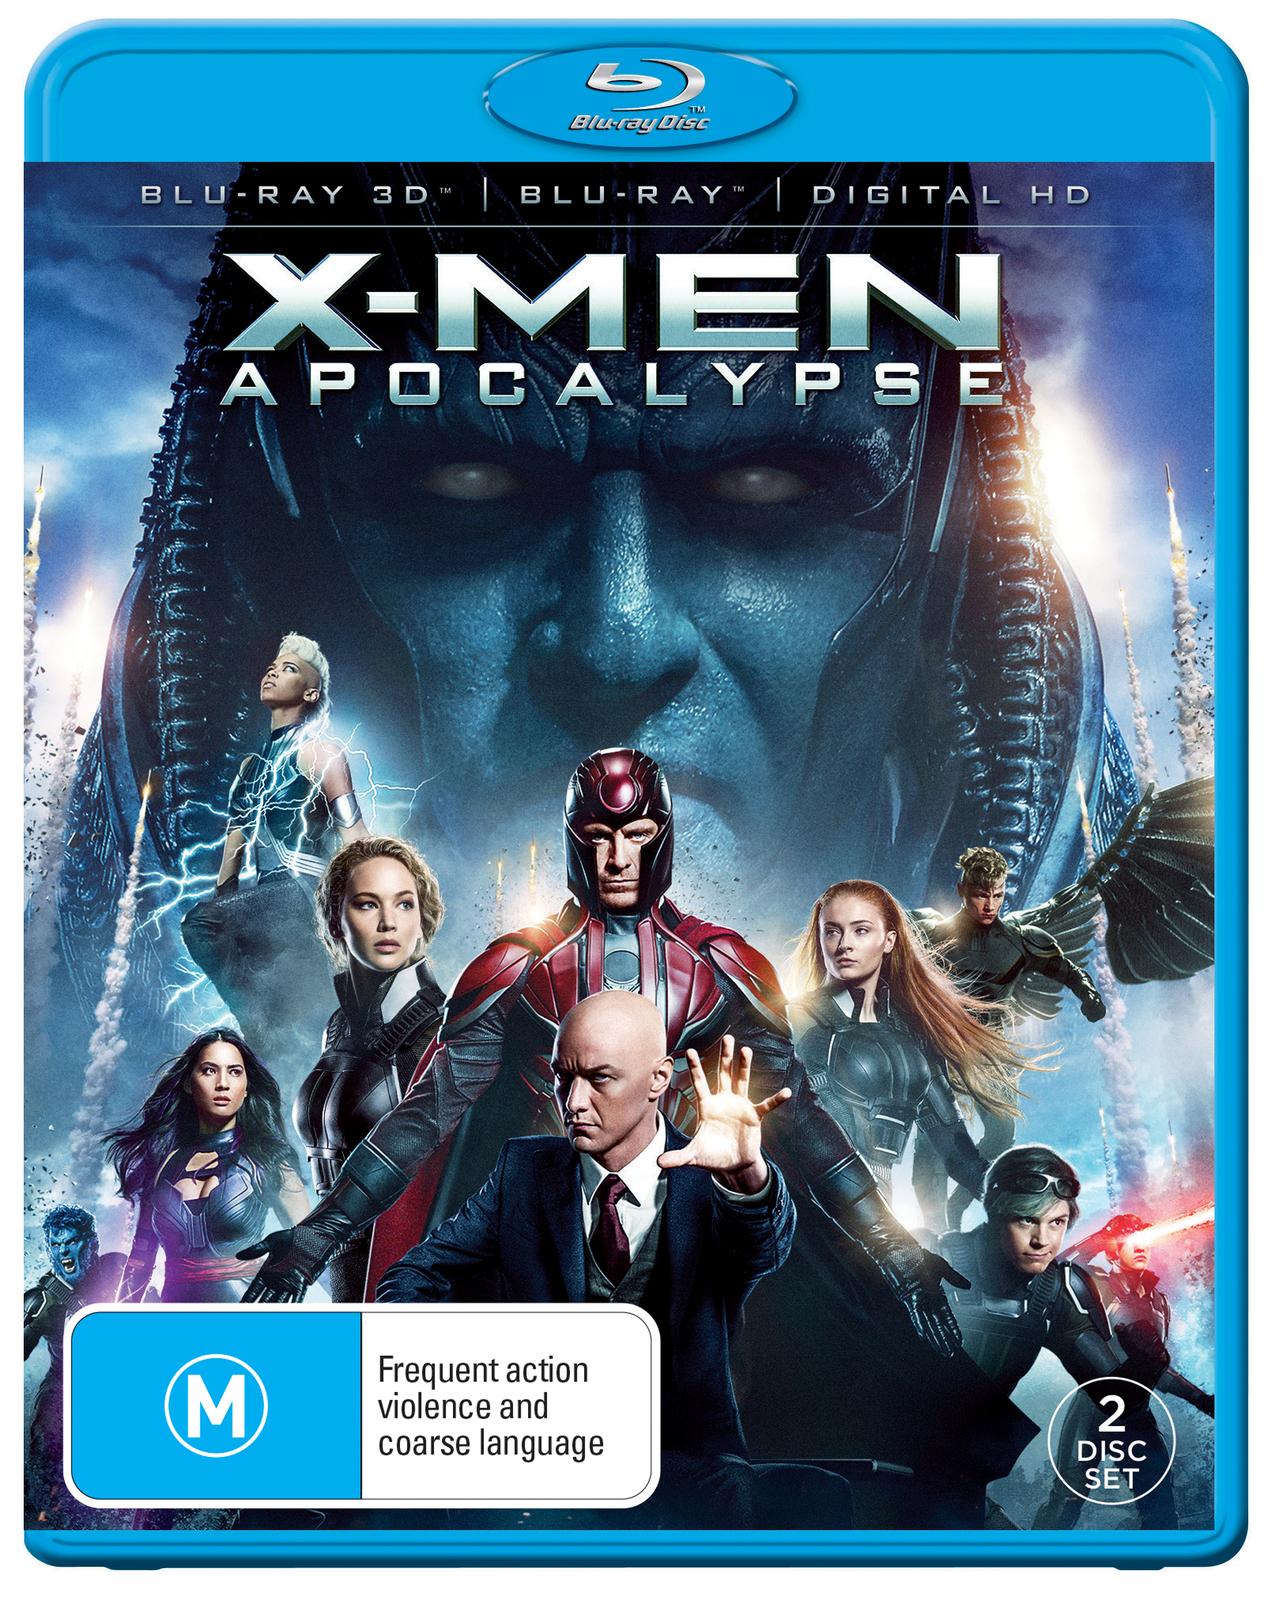 X-Men Apocalypse on Blu-ray, 3D Blu-ray image